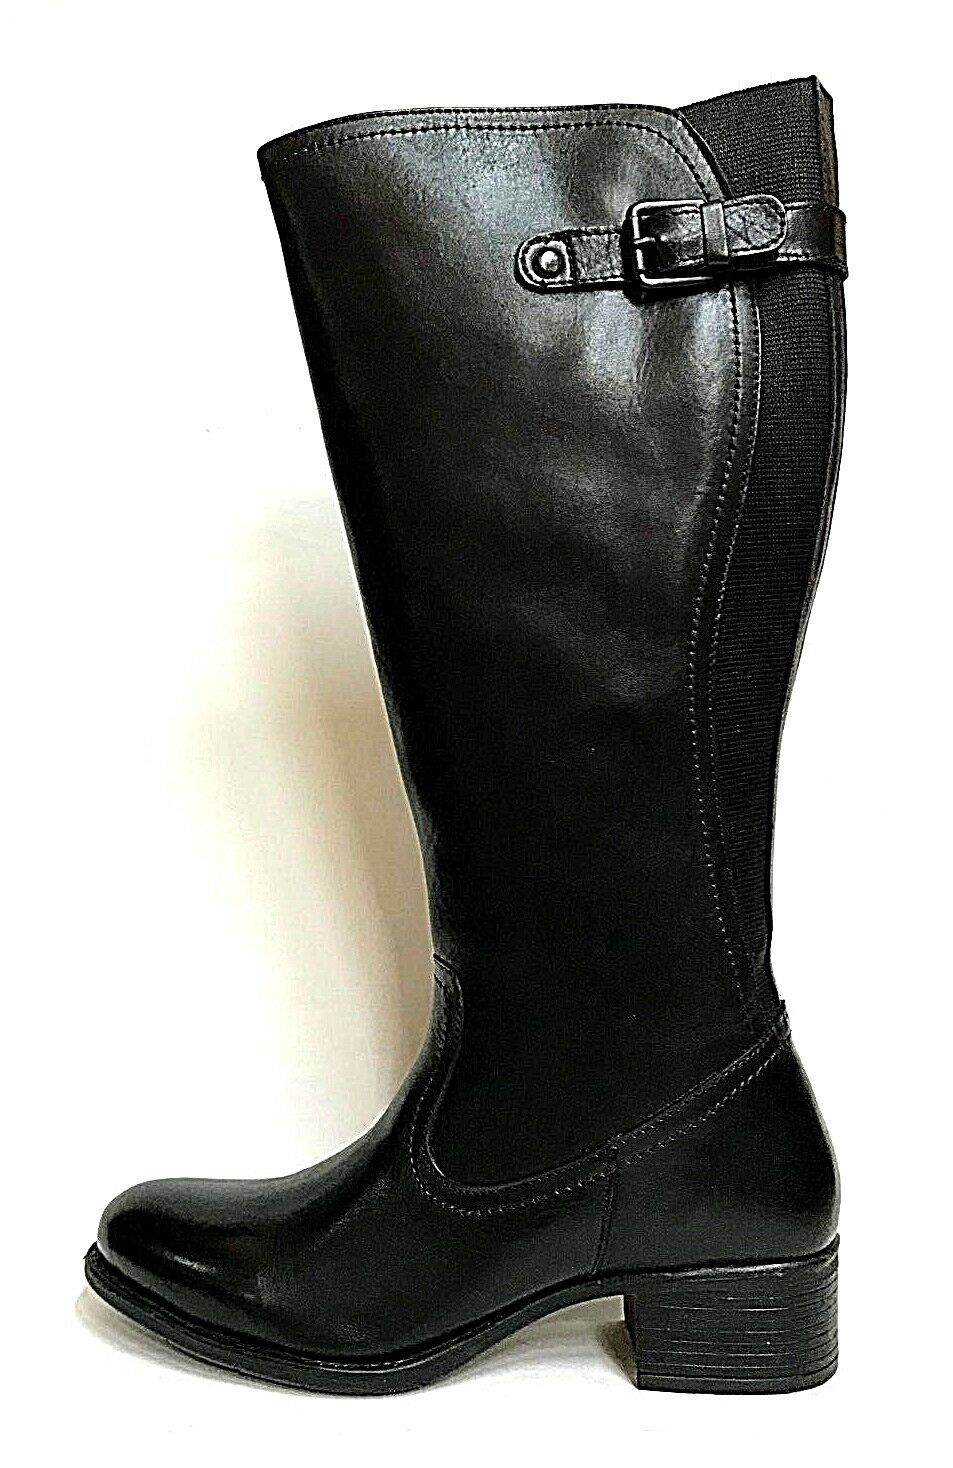 zapatos mujer PREGUNTA zapatos botas 5351 negro 100% PELLE INVERNO SCONTO 50%